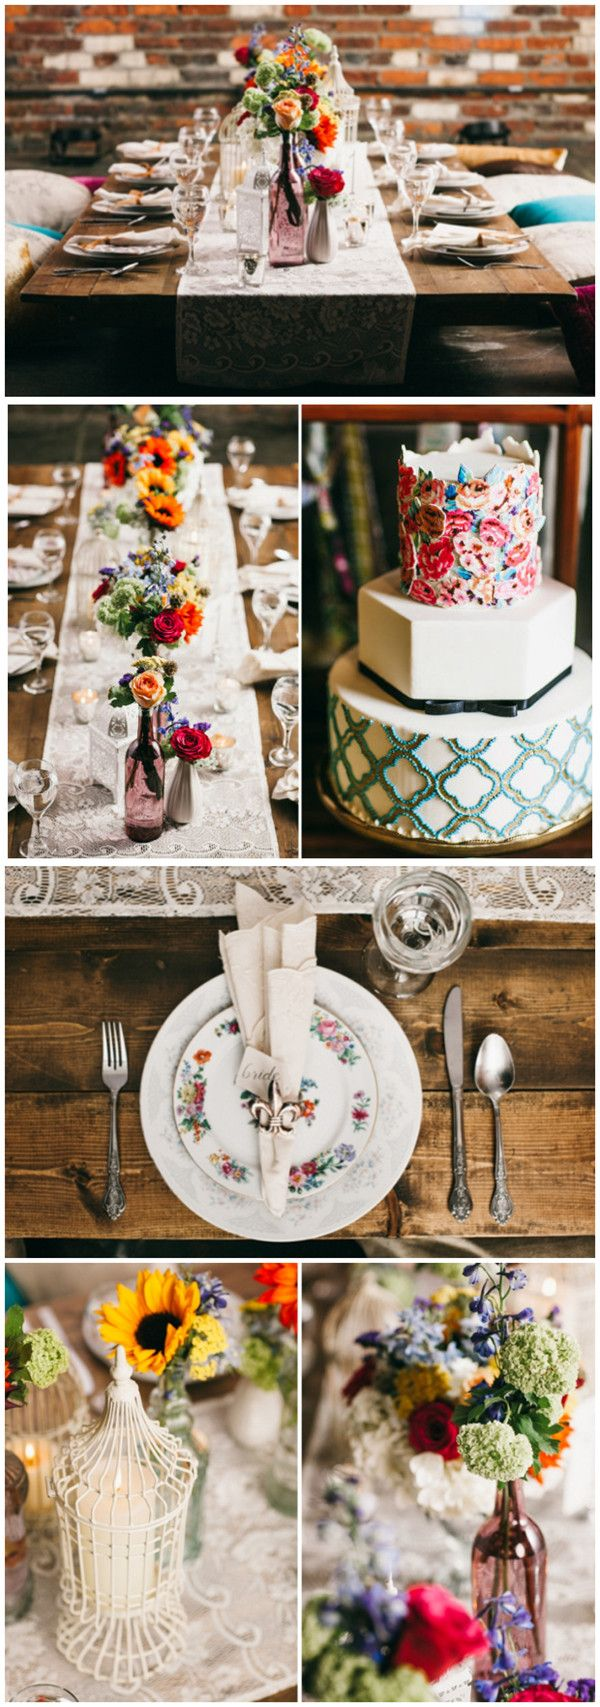 Vintage Bohemian Hochzeit Inspiration. Re-pin if you like. Via Inweddingdress.com #vintagewedding